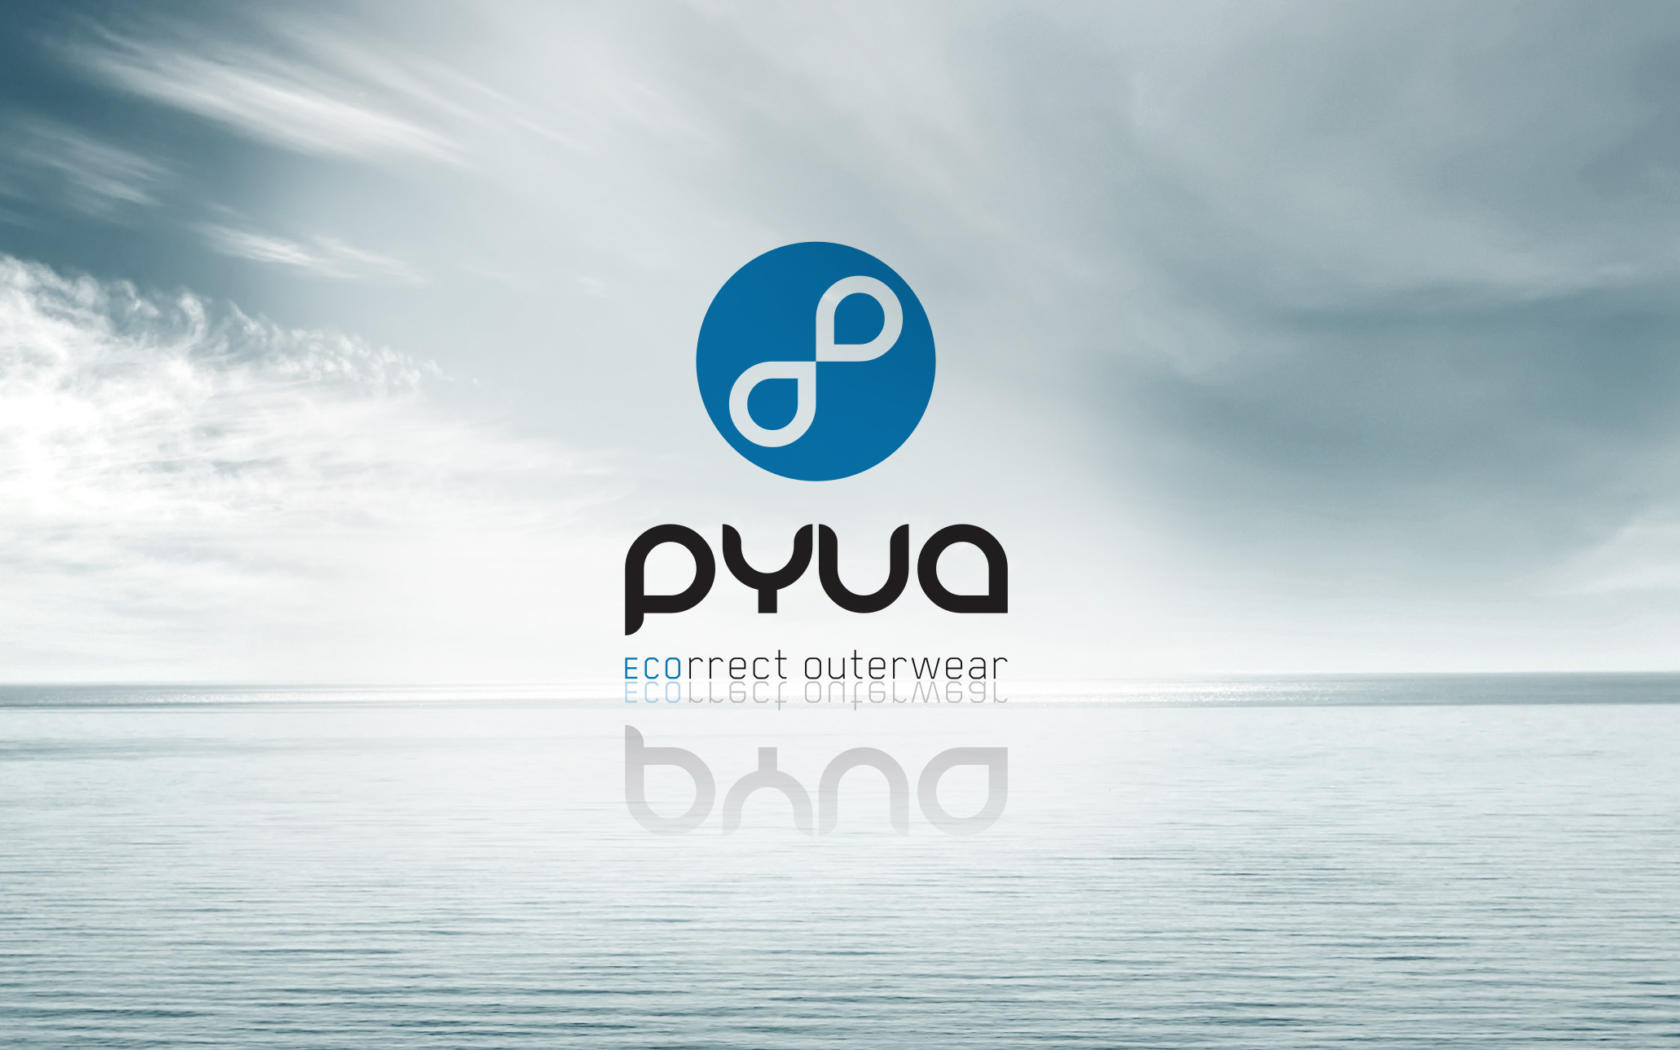 PYUA-Brandbook-Corporate_Design_00-1680x1050